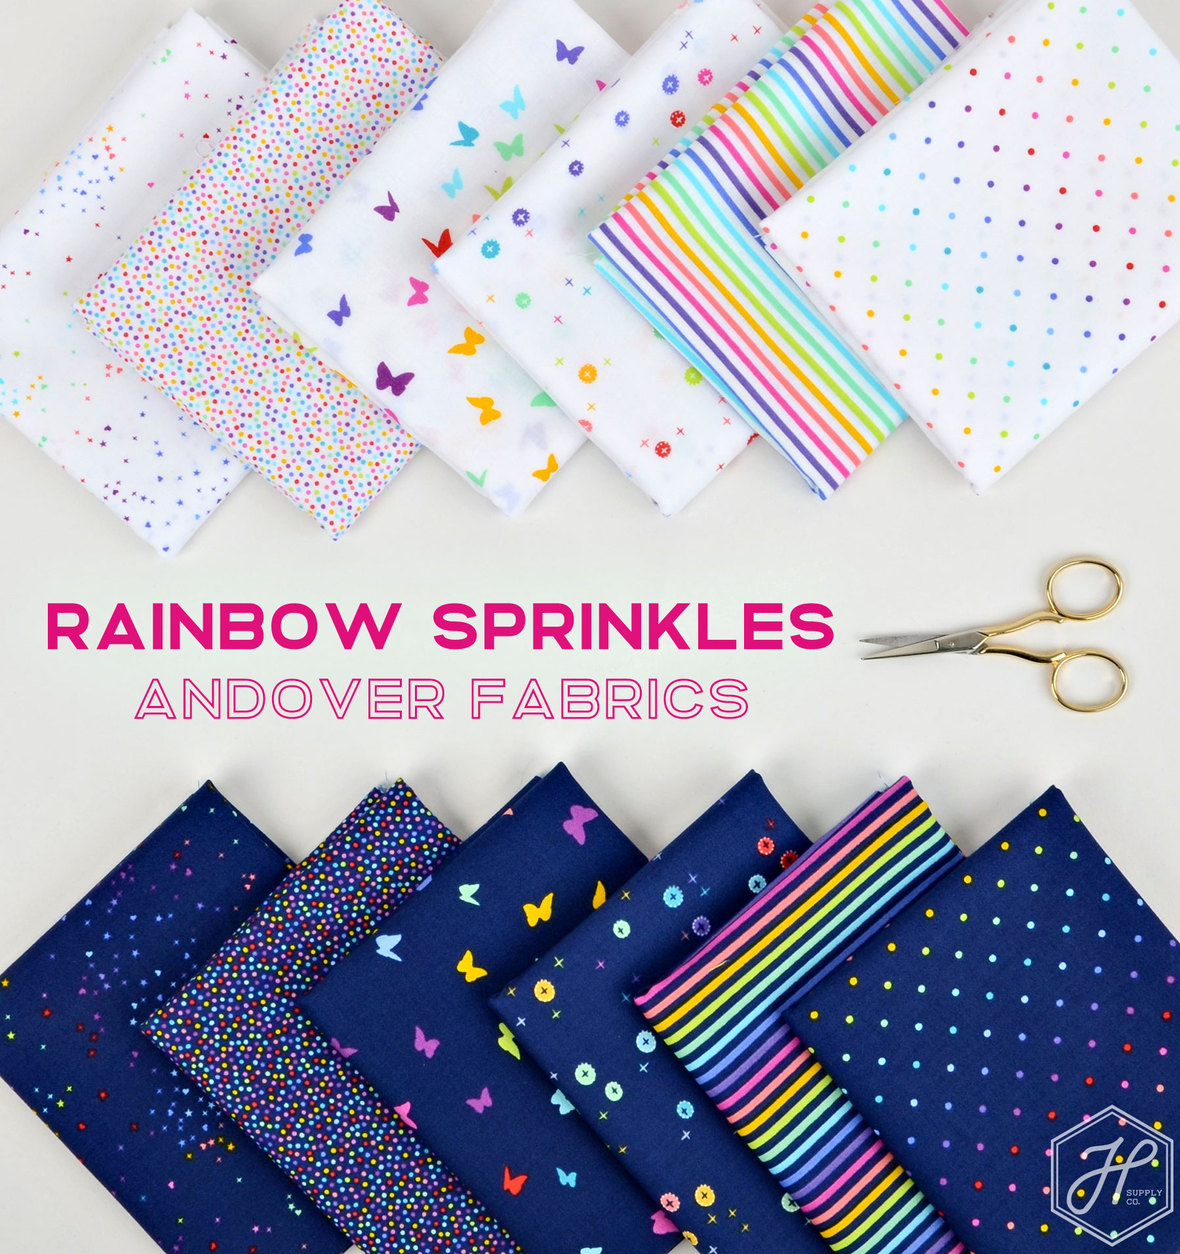 Rainbow-Sprinkles-Fabric-Andover-at-Hawthorne